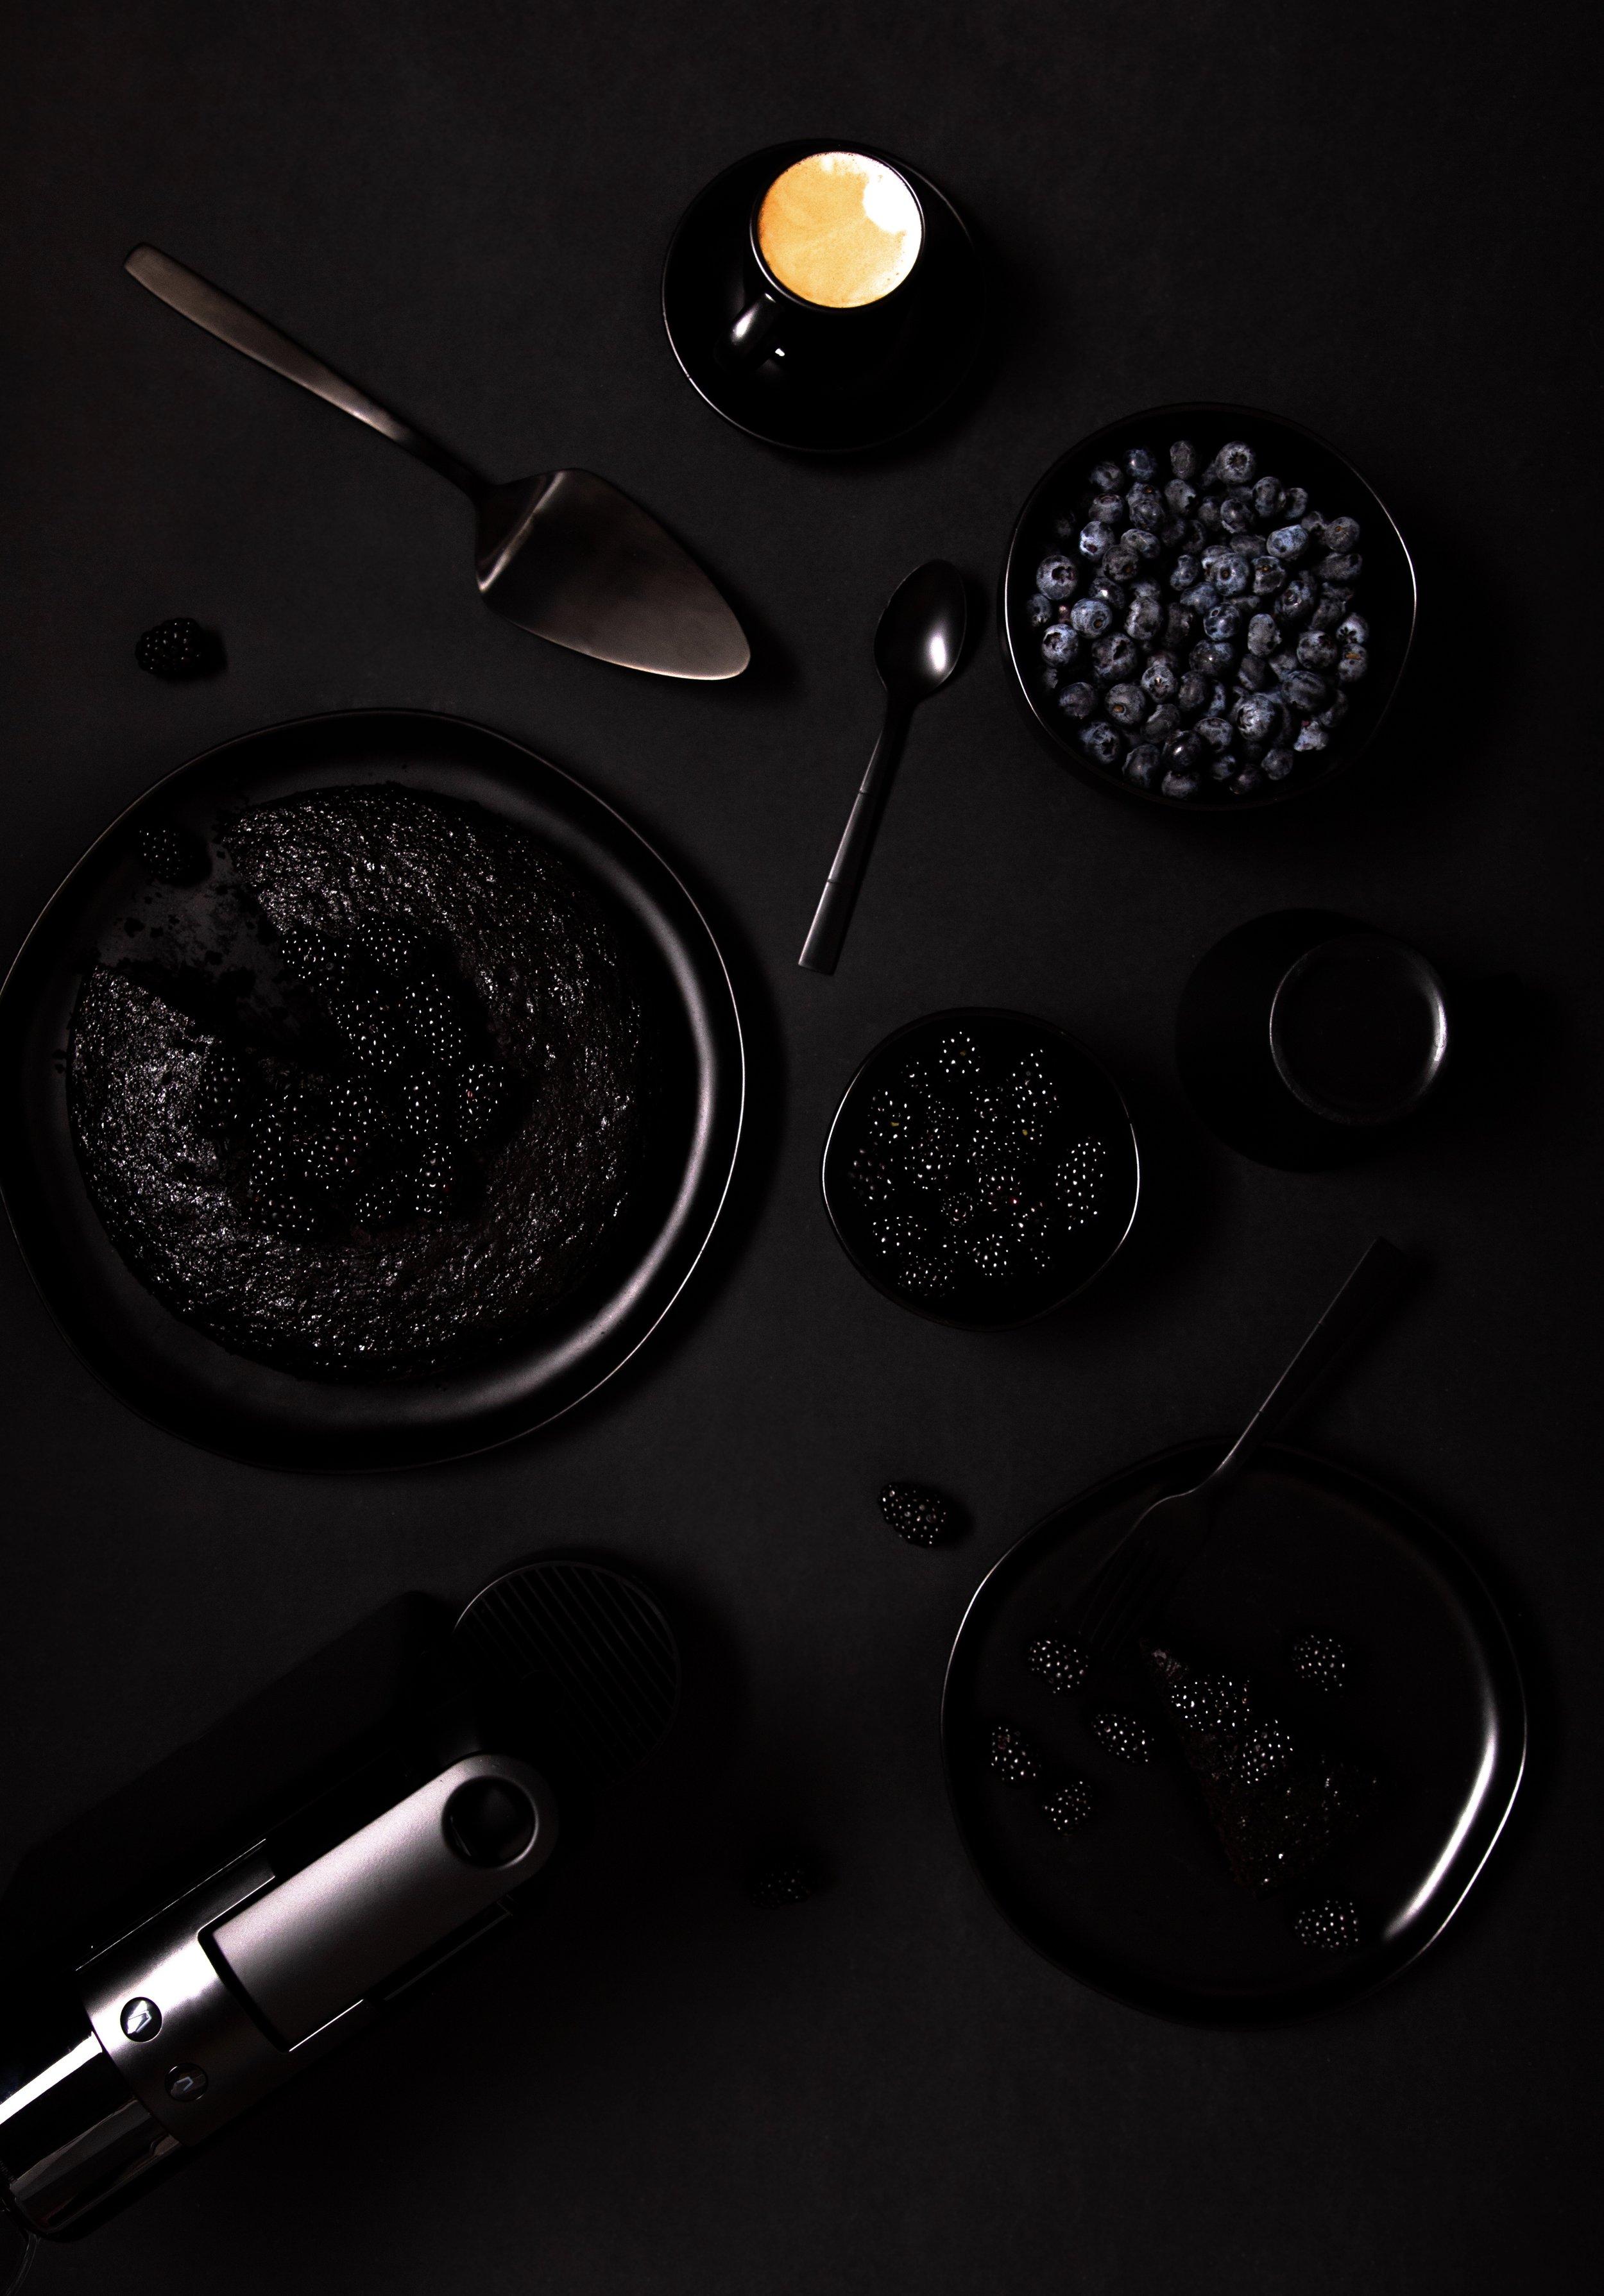 rosso-black-image-1.jpg